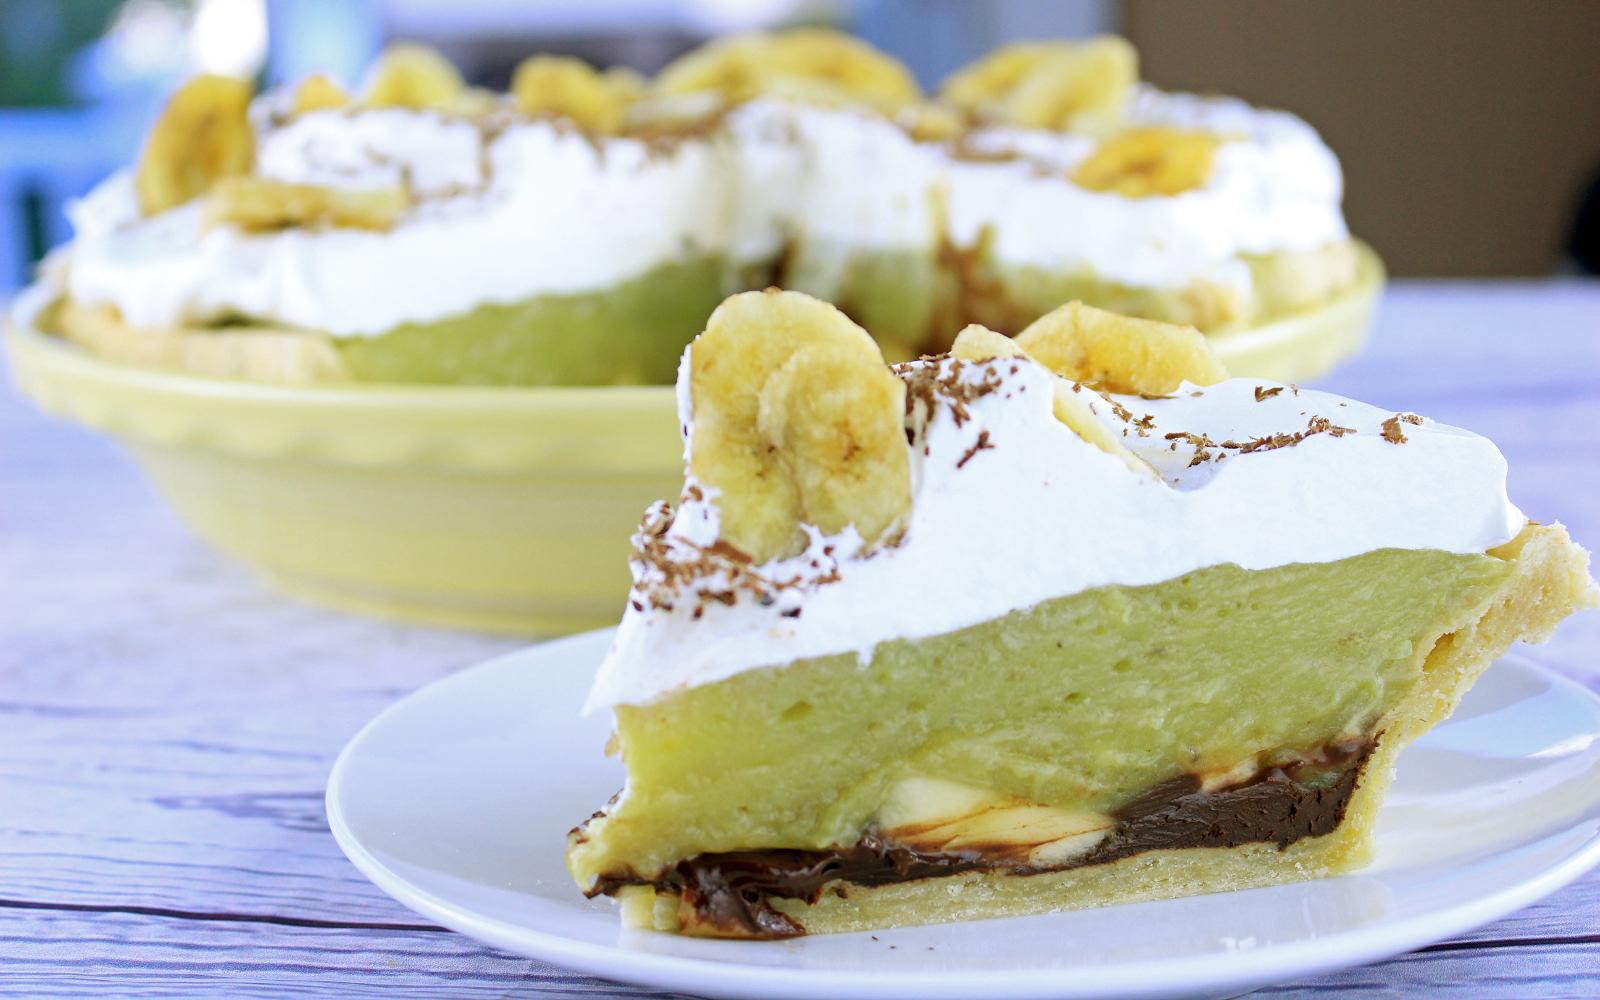 Vegan Black Bottom Banana Cream Pie with whipped topping